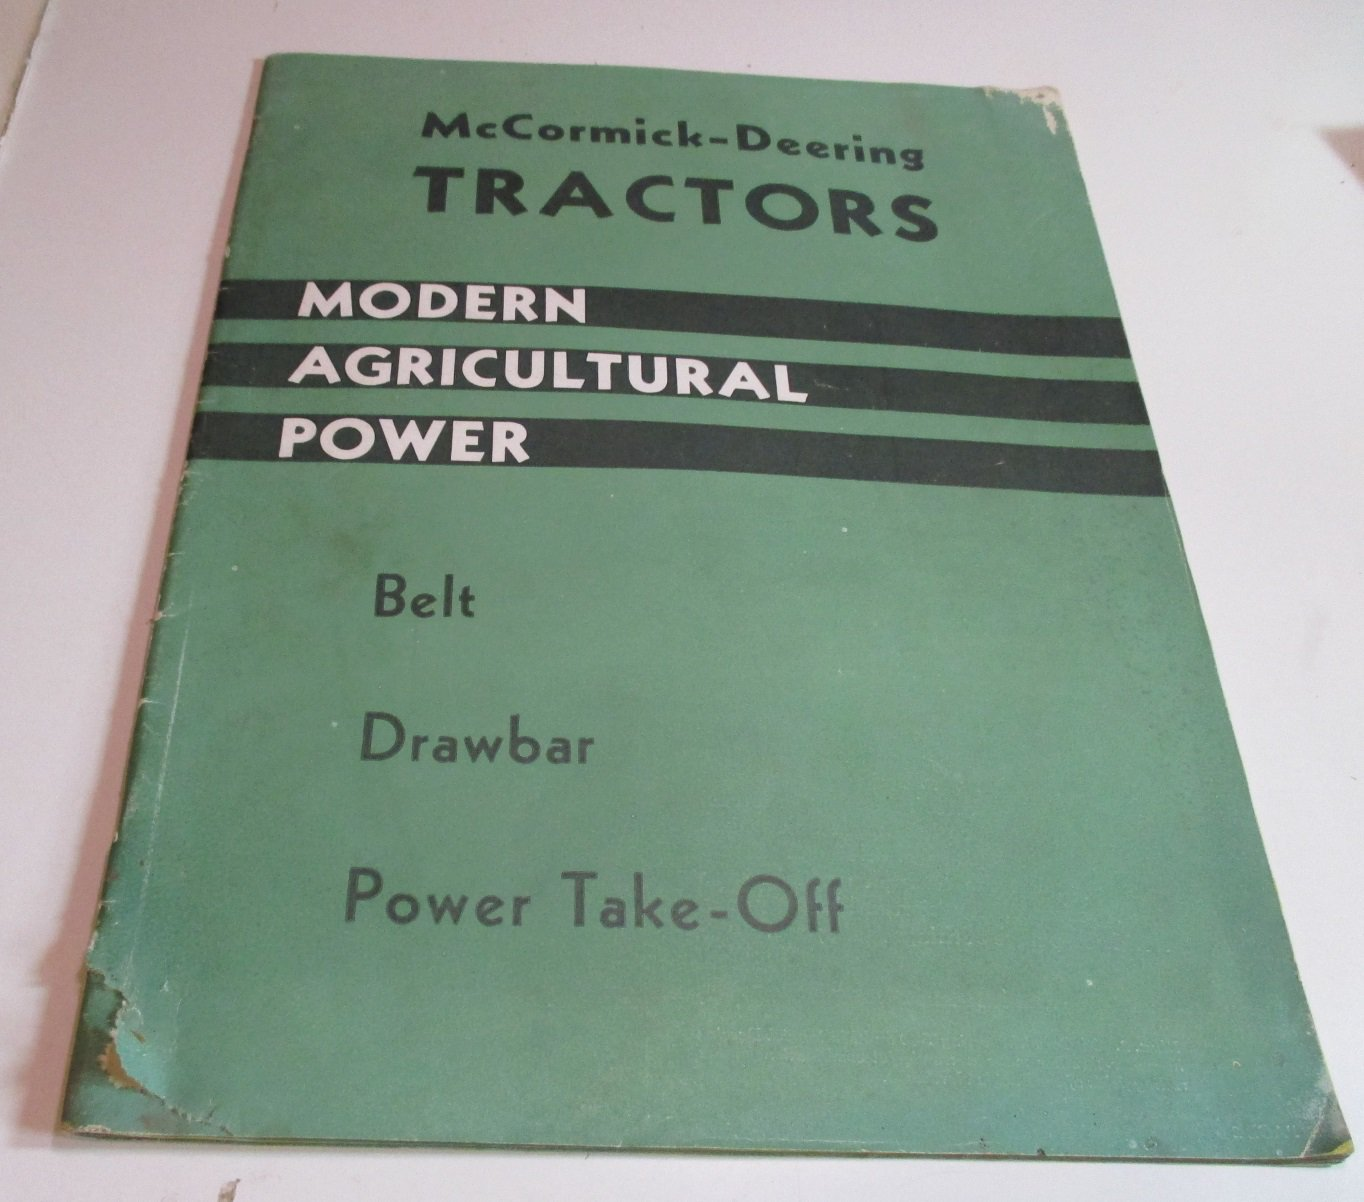 IH mccormick deering tractors modern agricultural power belt-drawbar-power take off